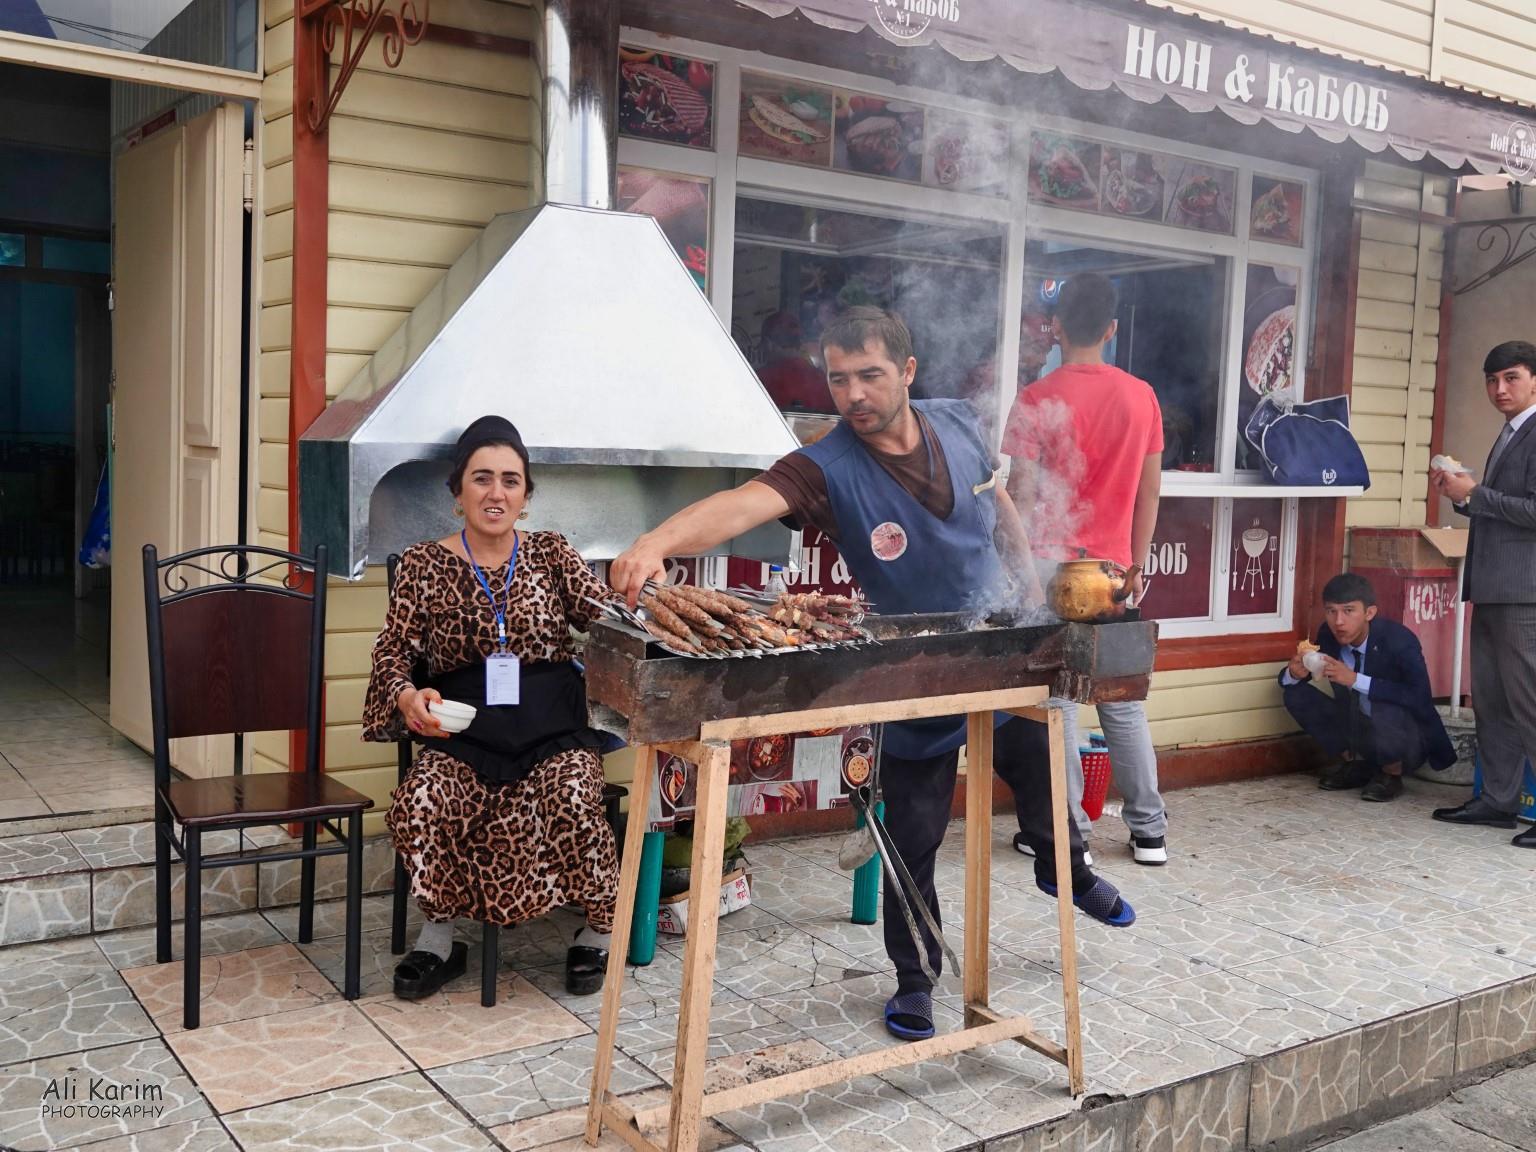 More Dushanbe, Tajikistan Non & Kebab restaurant (Naan & Kebab) in the market